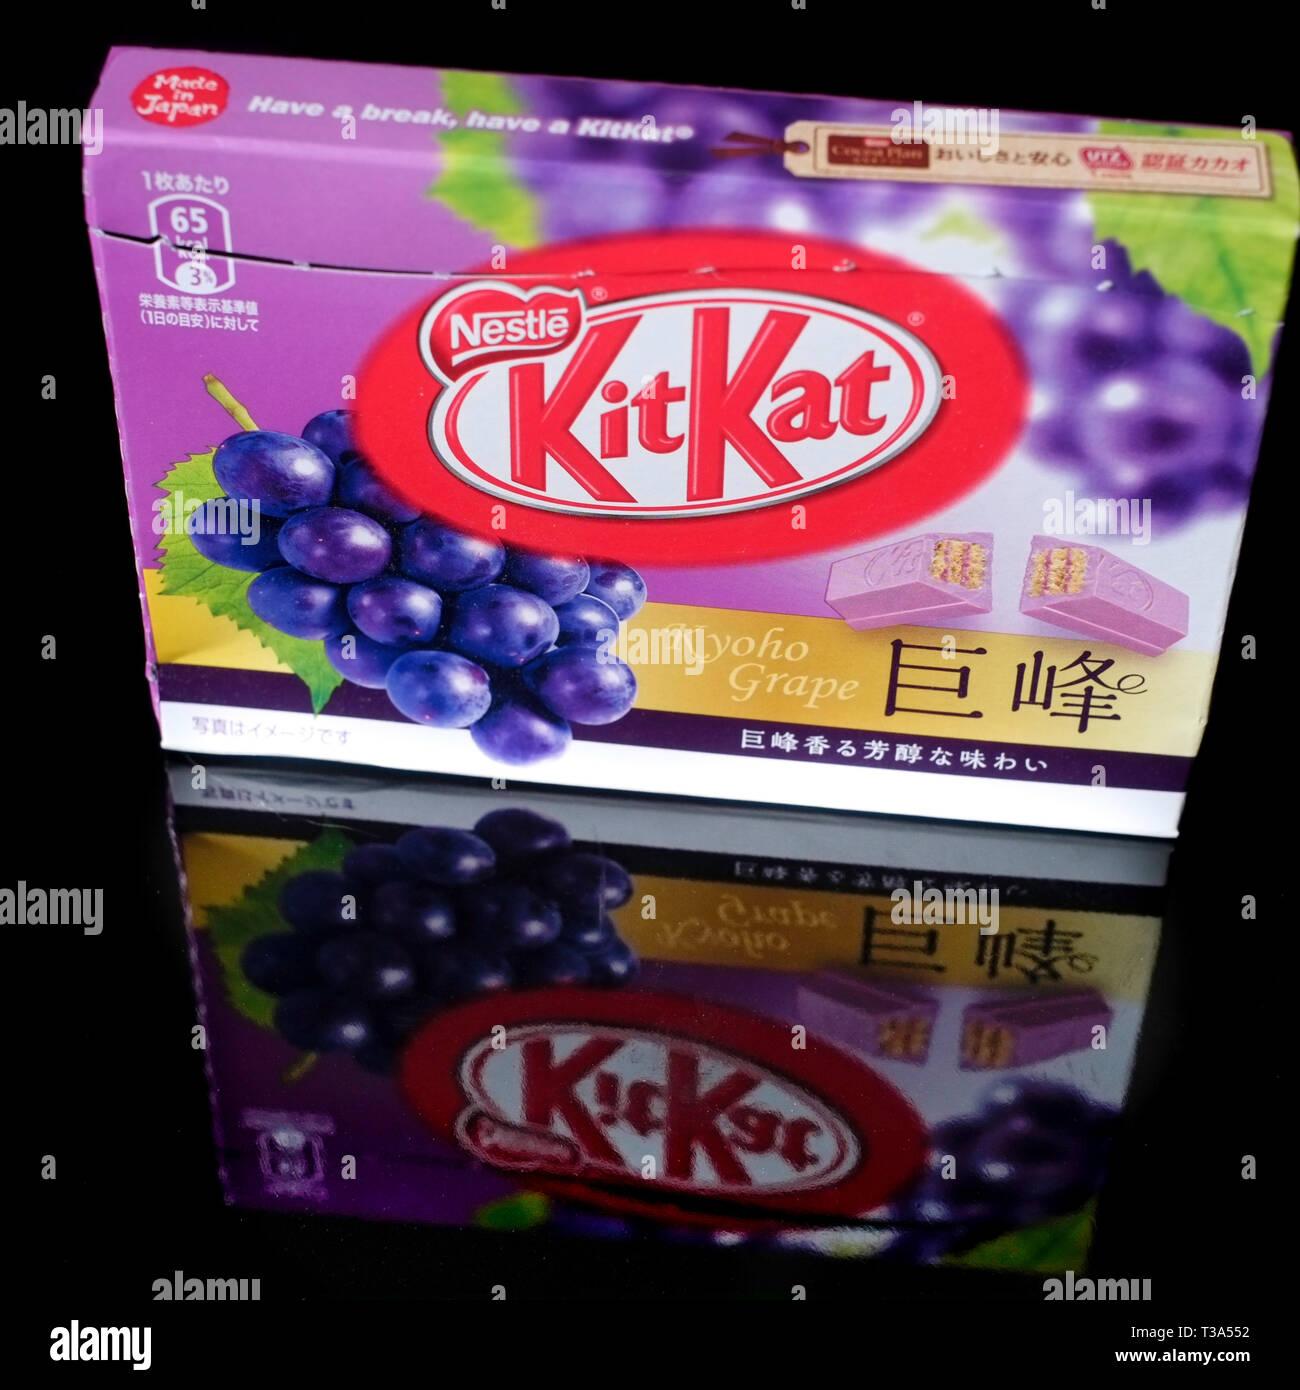 A Japanese Kyoho Grape Kit Kat. - Stock Image